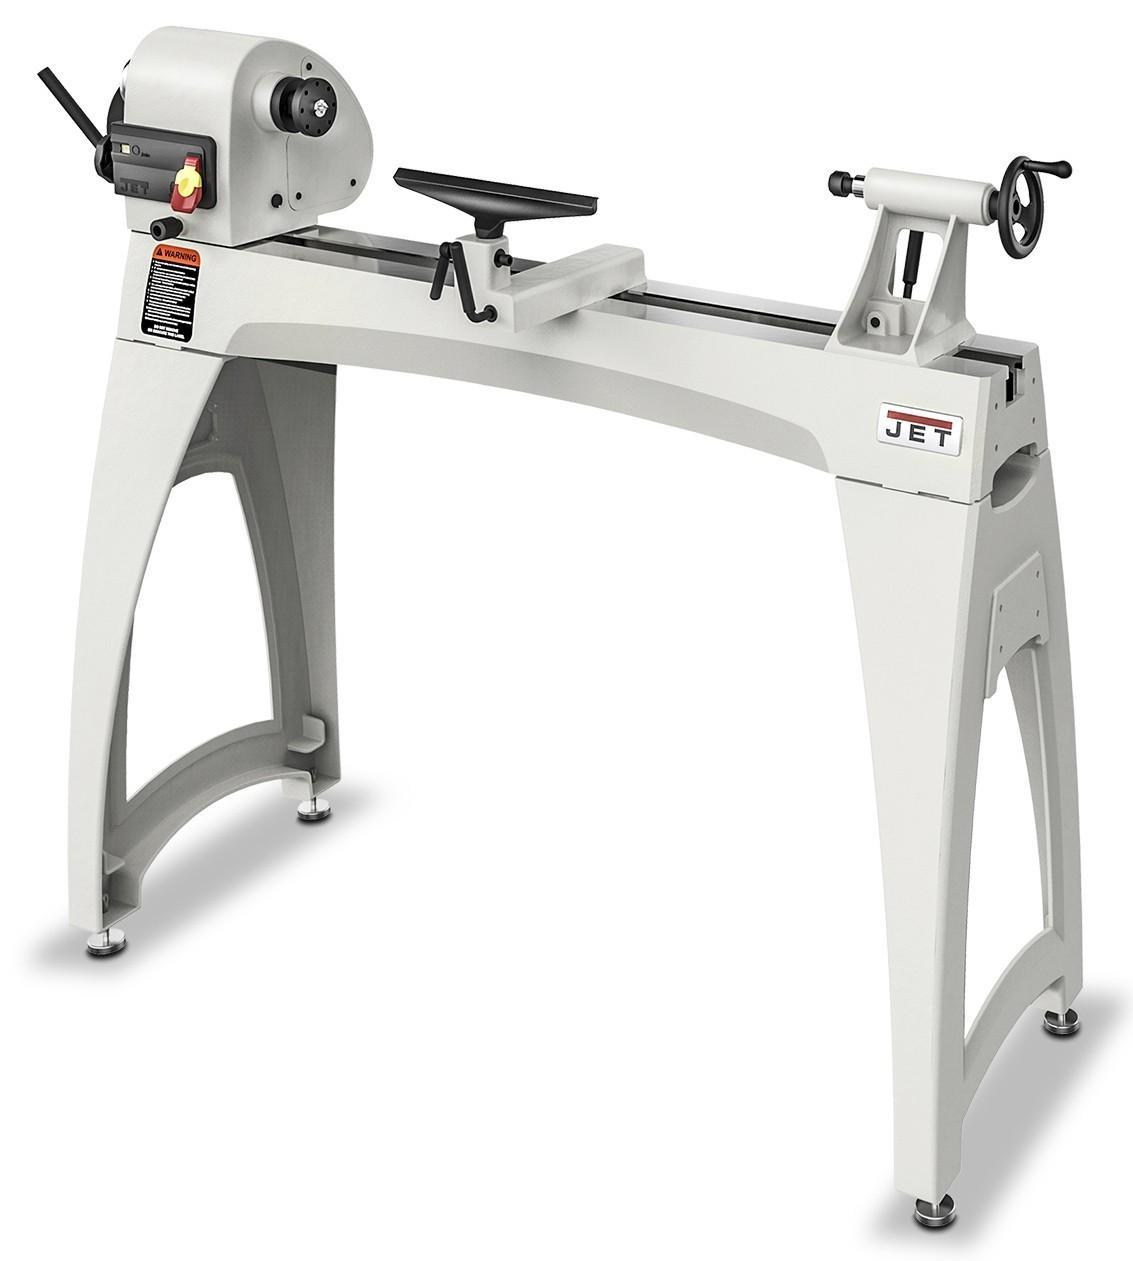 Woodworking Machines - Wood lathes - Wood Lathe JET JWL-1440VS-M